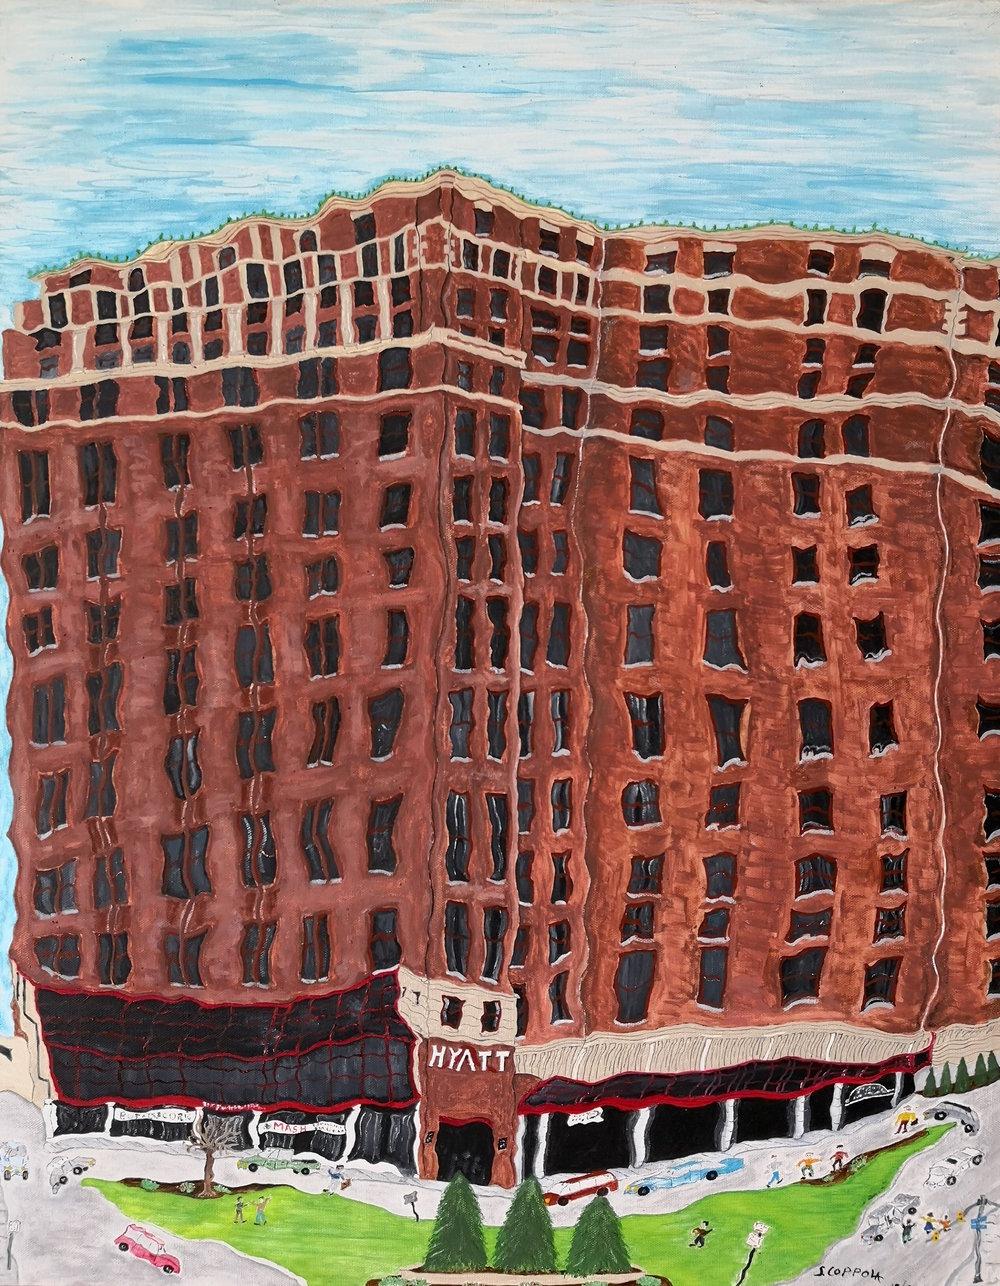 Stephen Coppola, Hyatt, Oil on canvas, 28 x 22 inches (71.1 x 55.9 cm)